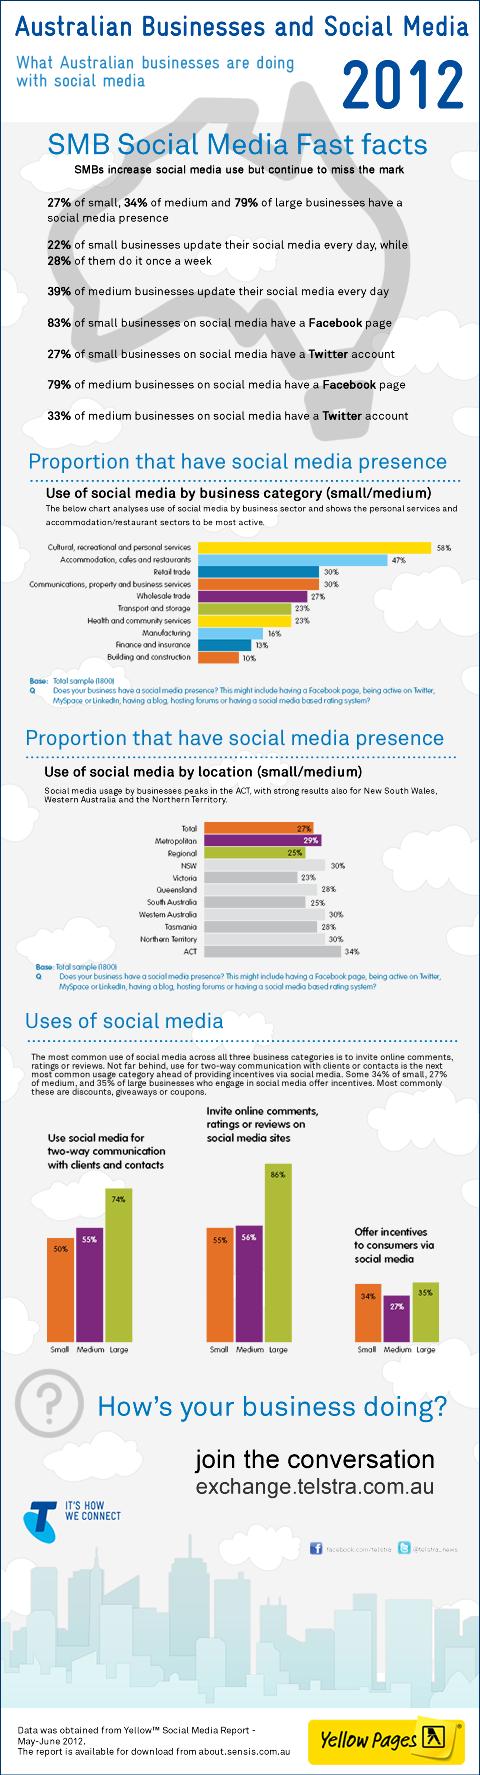 Social Media and Australian Business. 2012